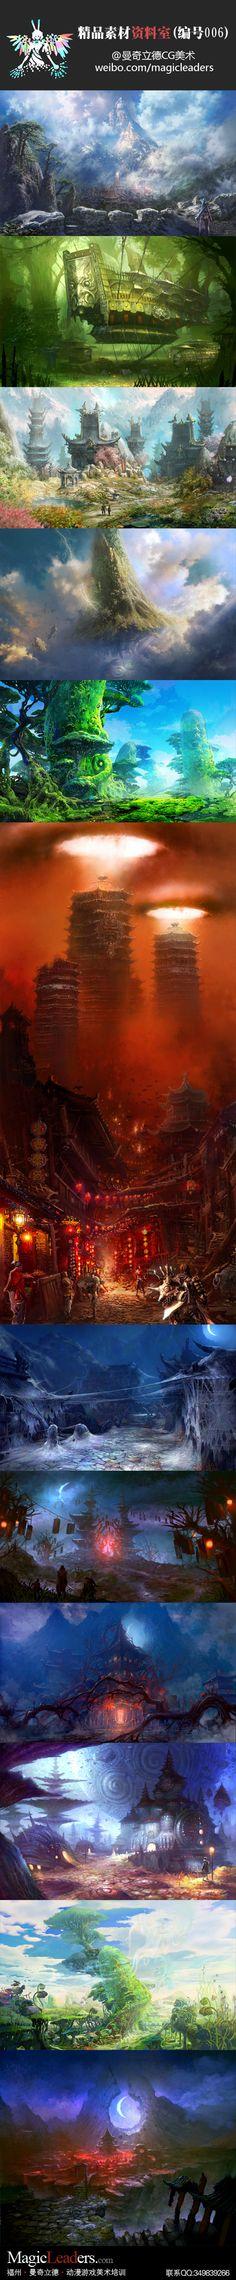 Click on image to enlarge....  【精品素材资料室(编号006)】剑灵最新场景设定赏析。